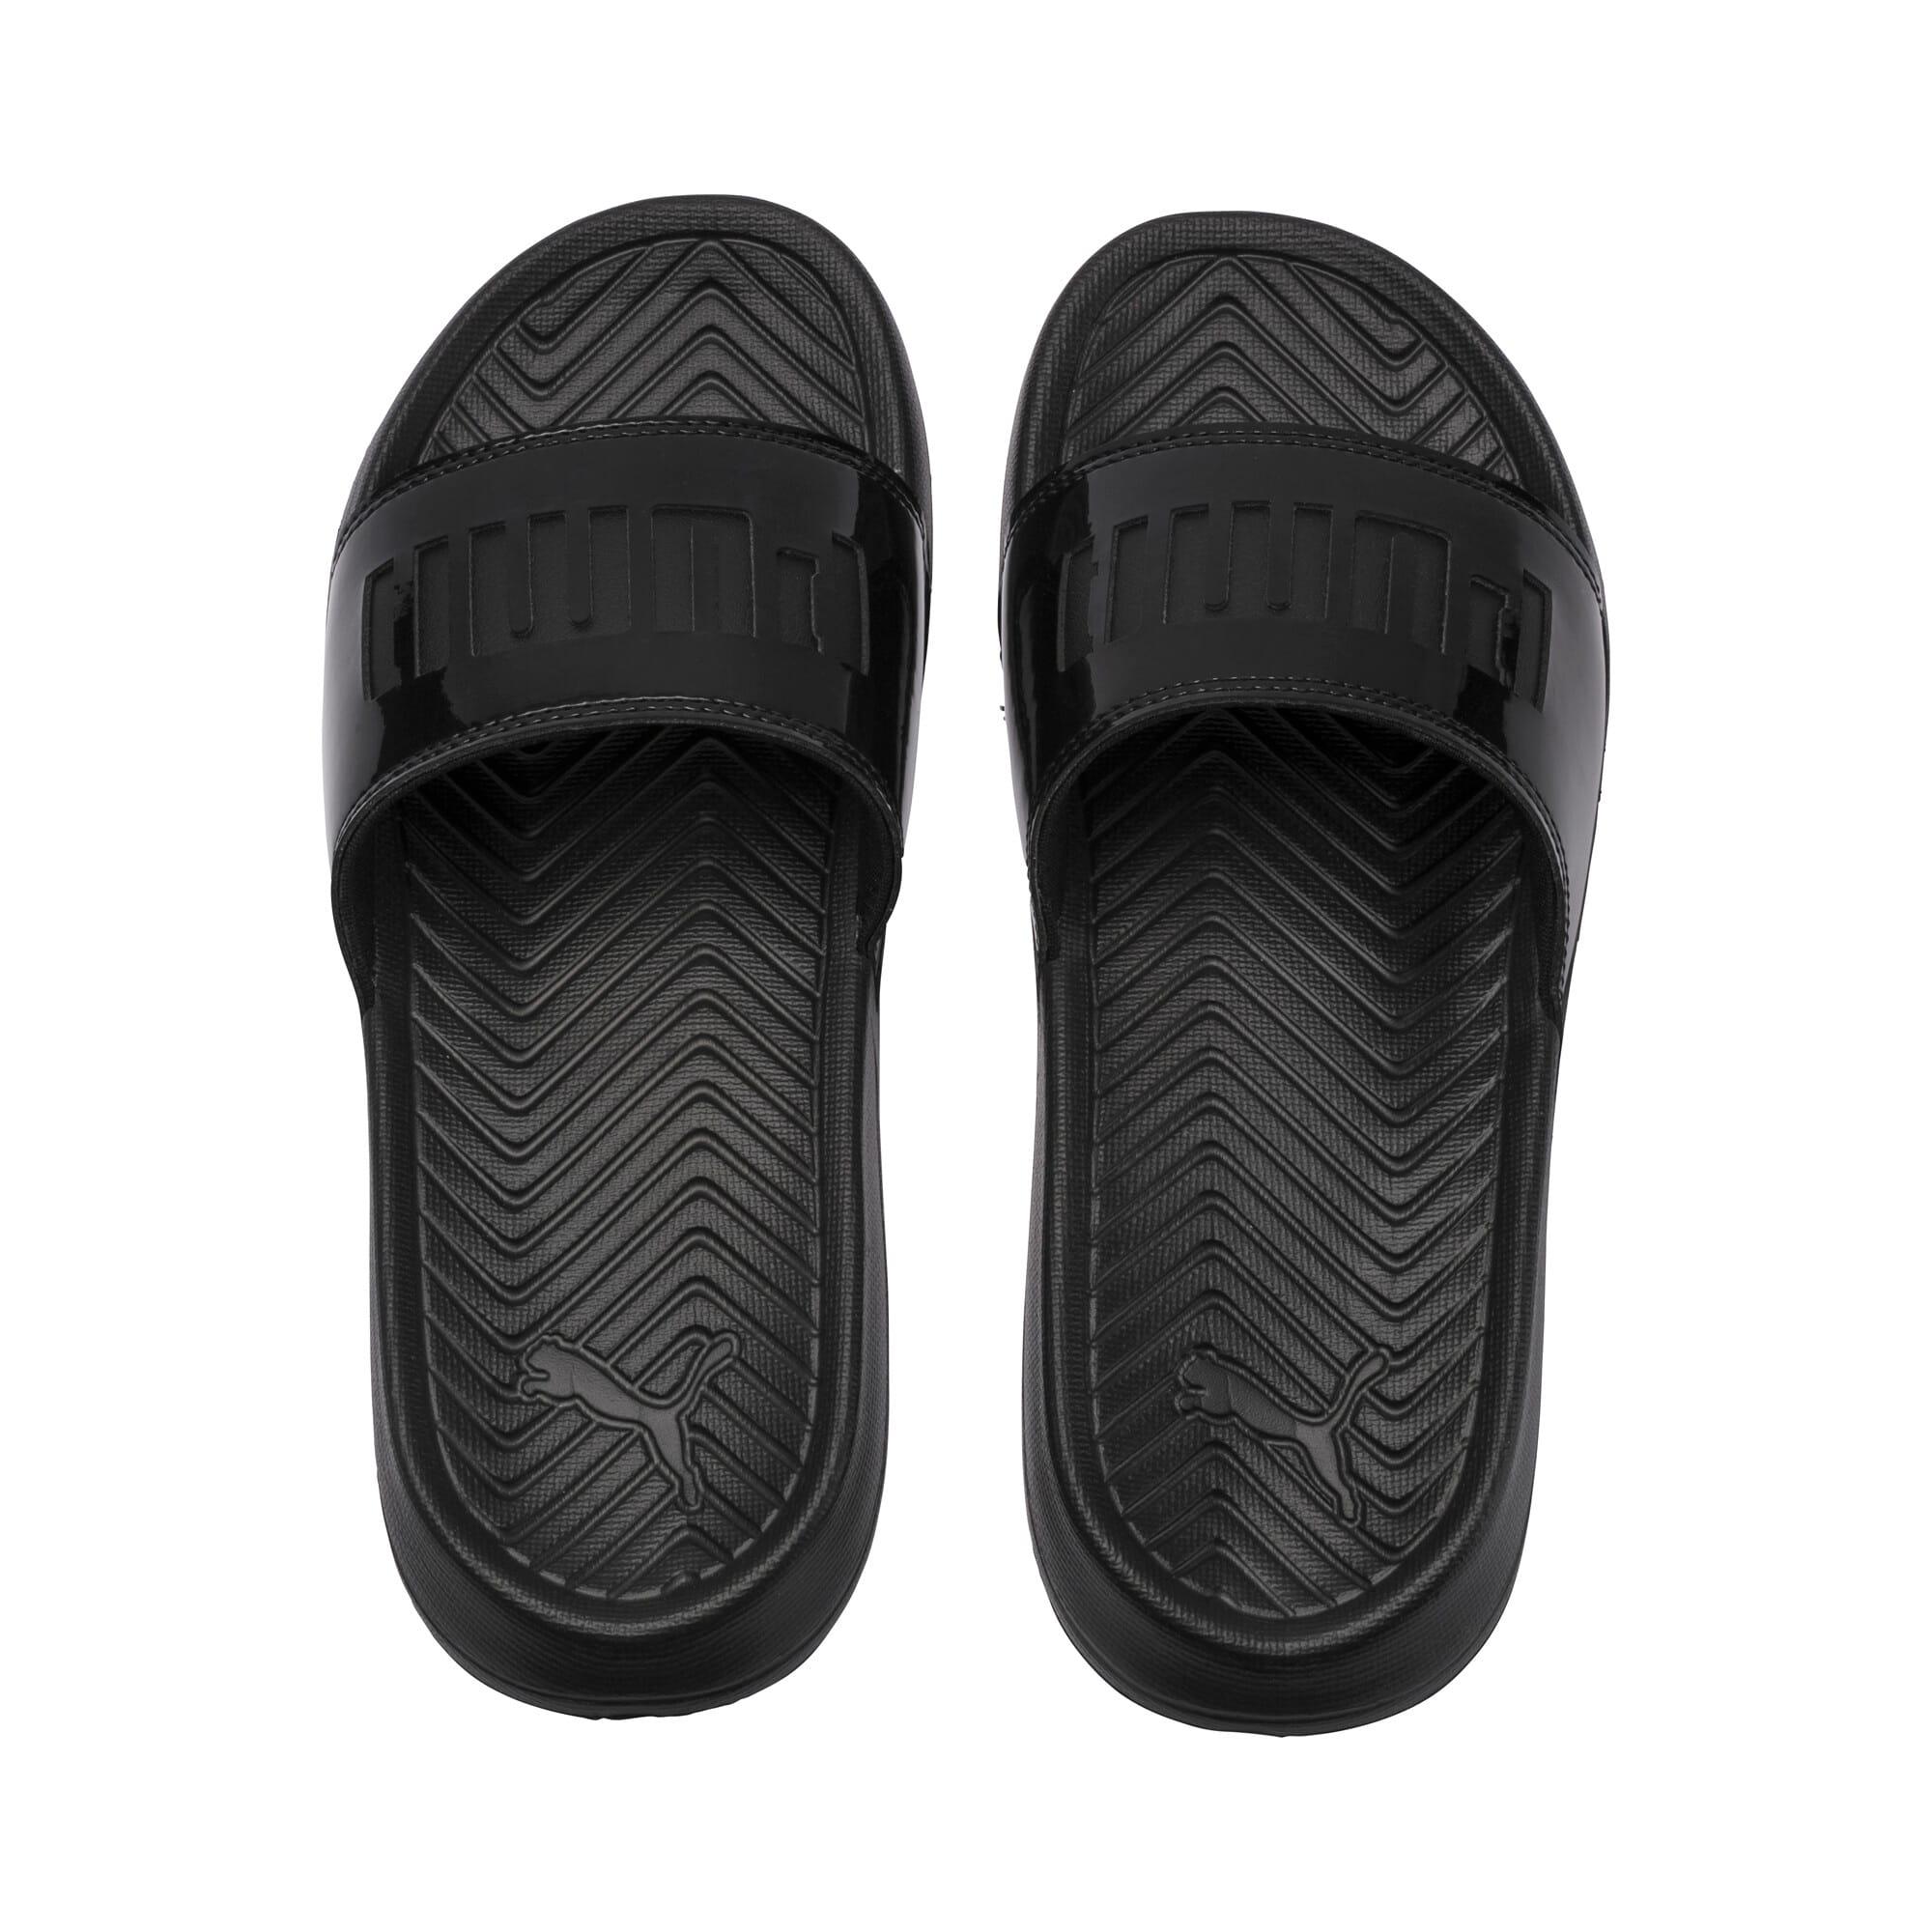 Thumbnail 6 of Popcat Patent Women's Sandals, Puma Black-Puma Black, medium